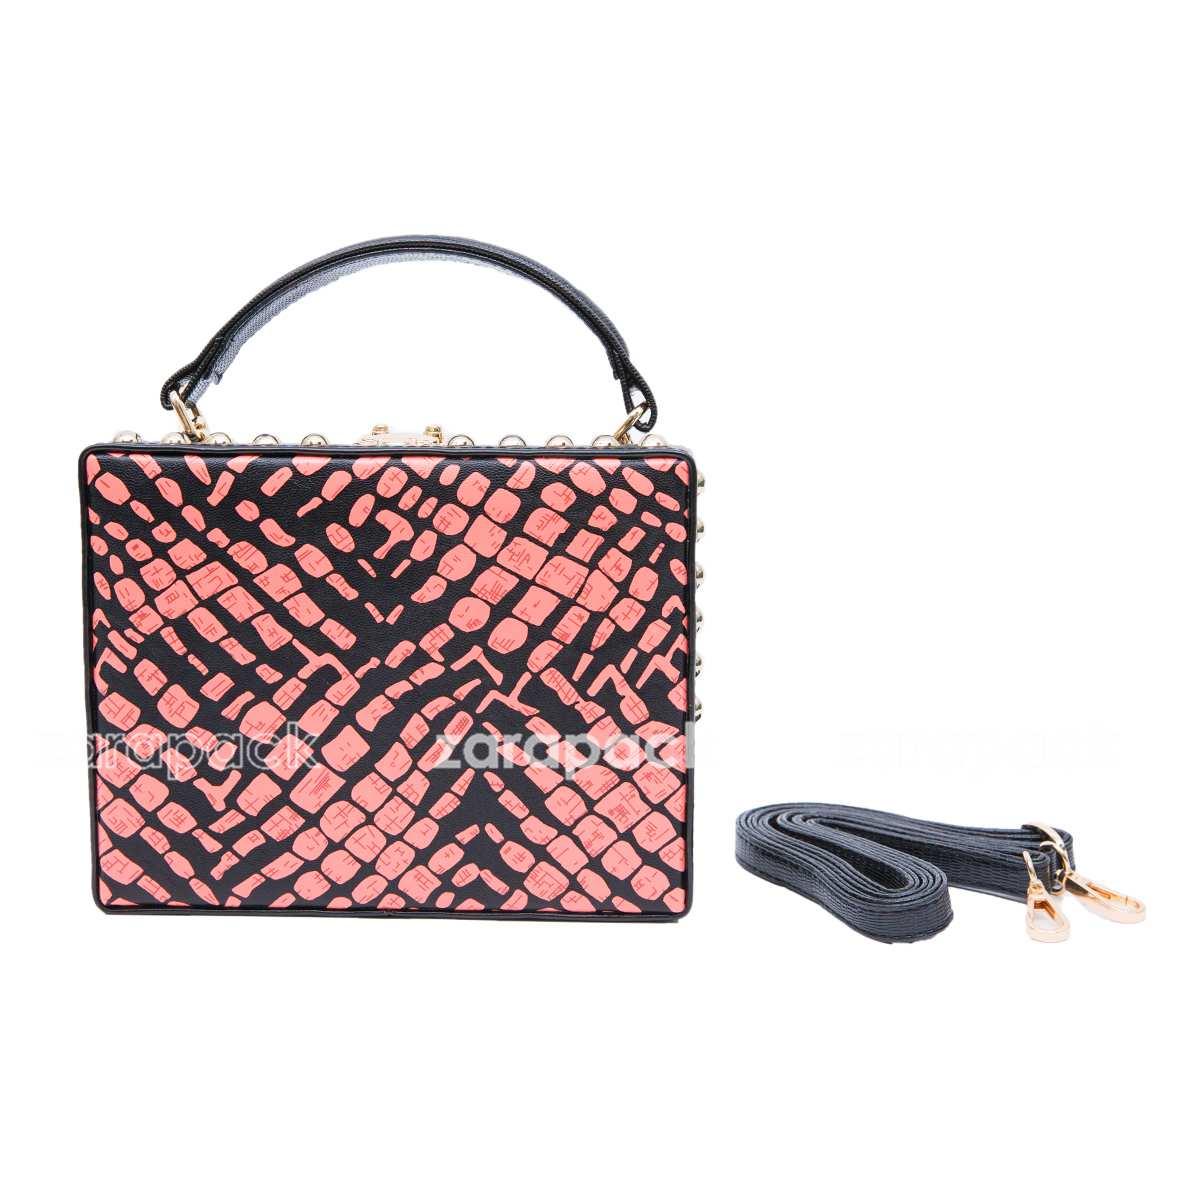 Luxury Designer Brand Women Handbag Runway Lady bag Purse Celebrity Love<br><br>Aliexpress